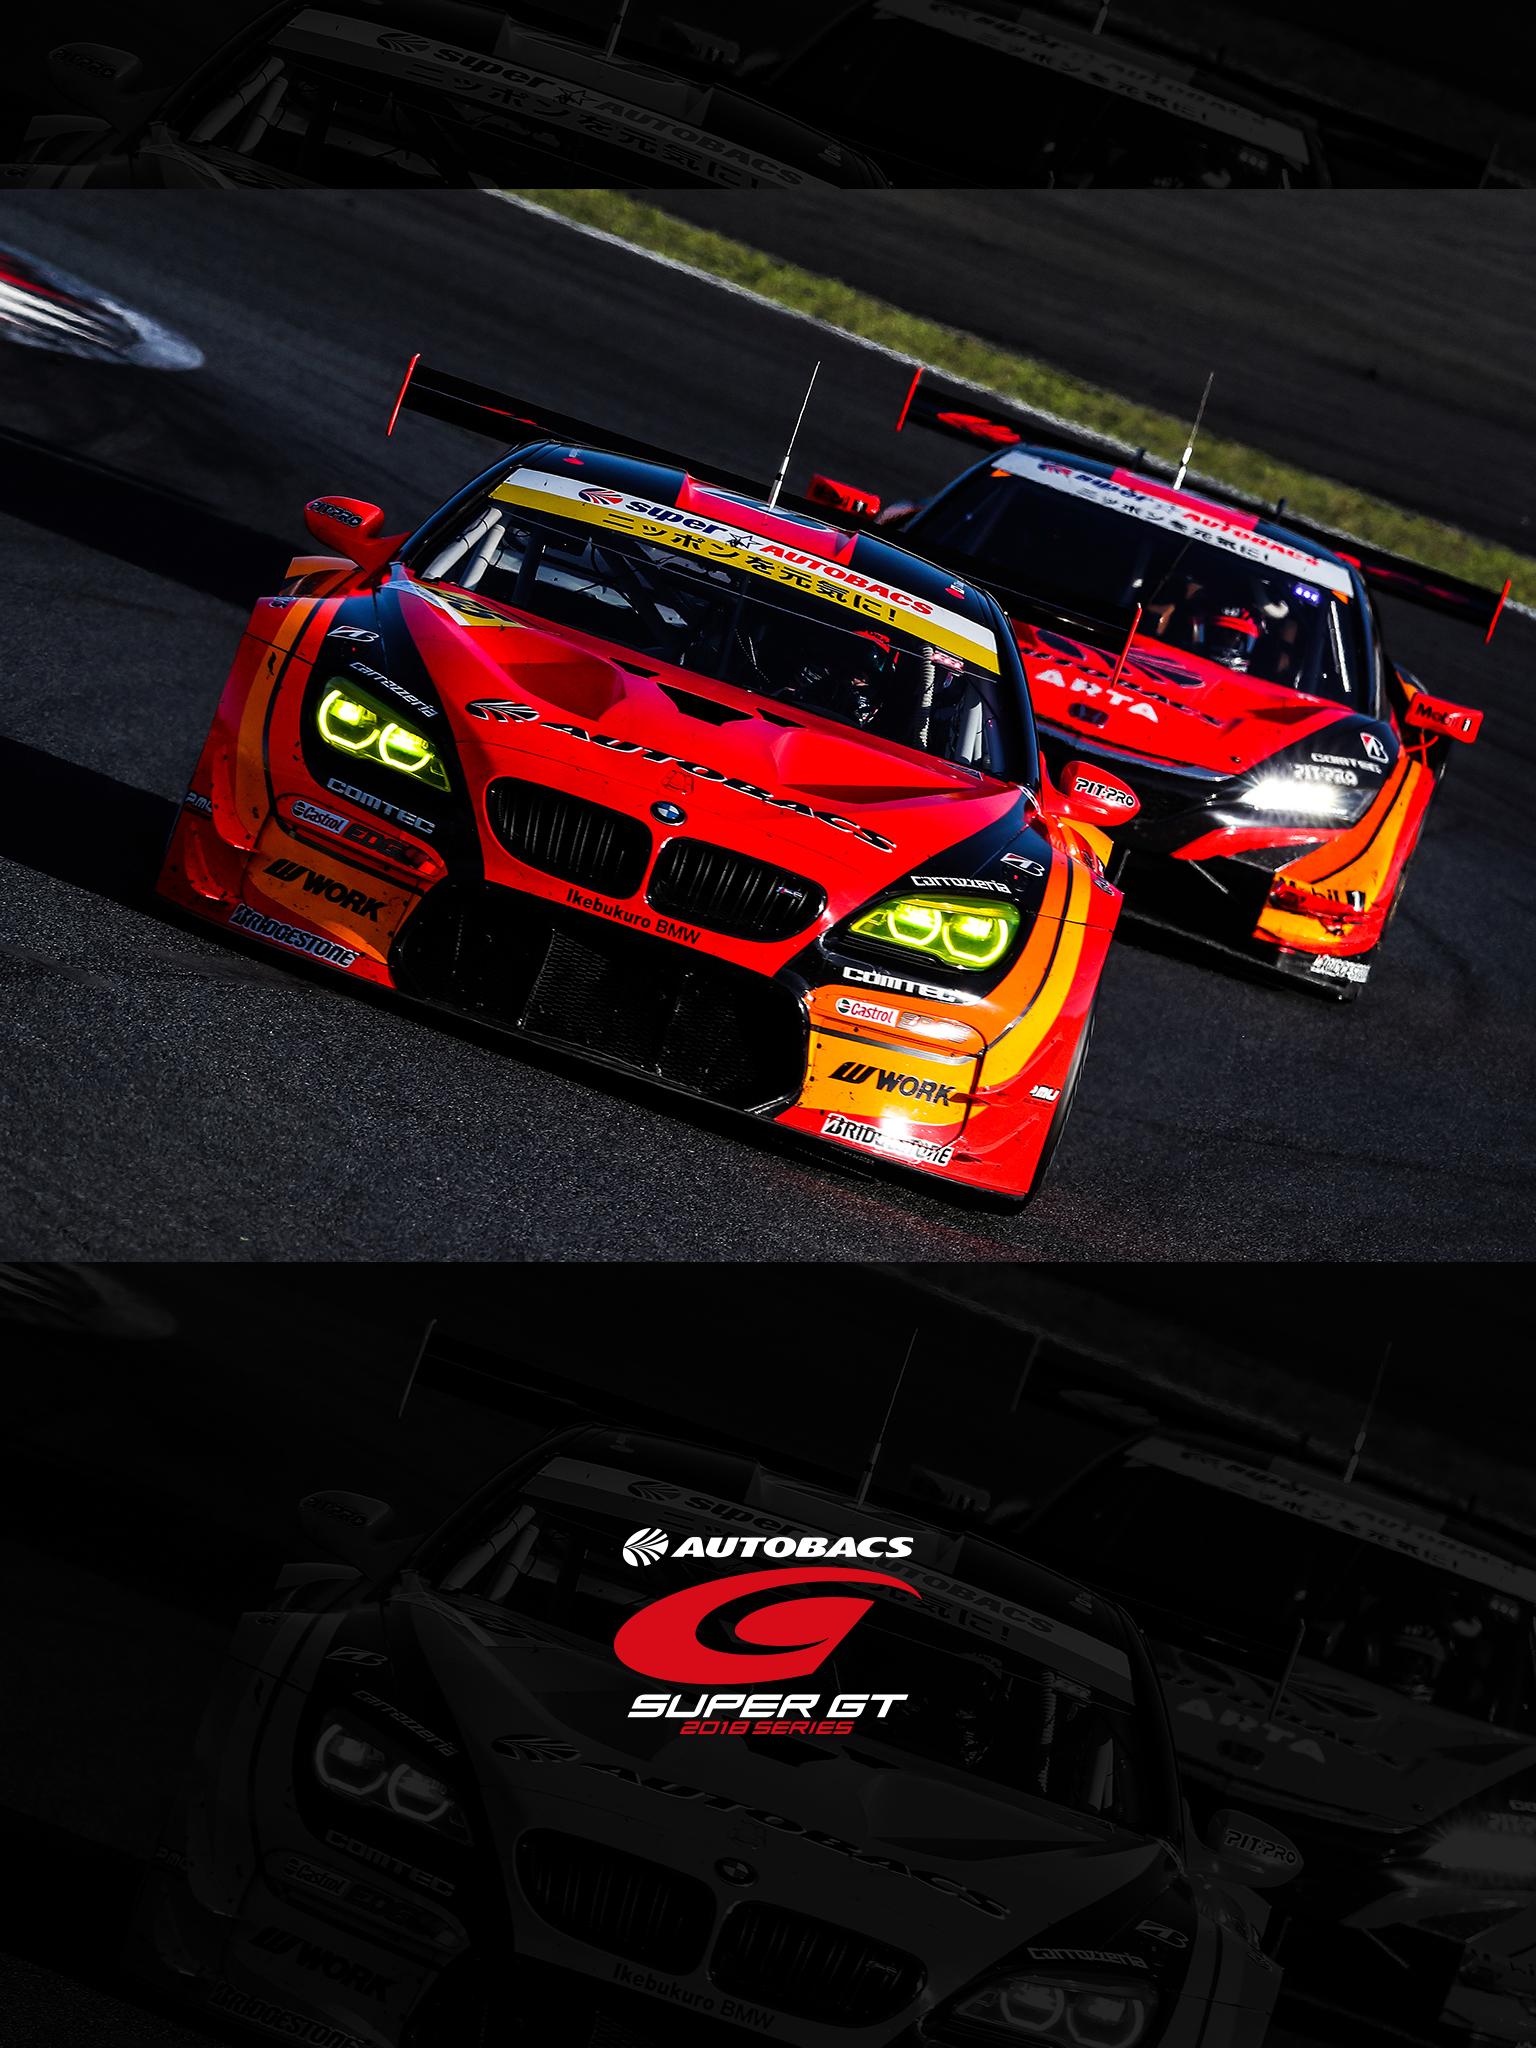 Wallpaper Round 2 Fuji Super Gt Official Website